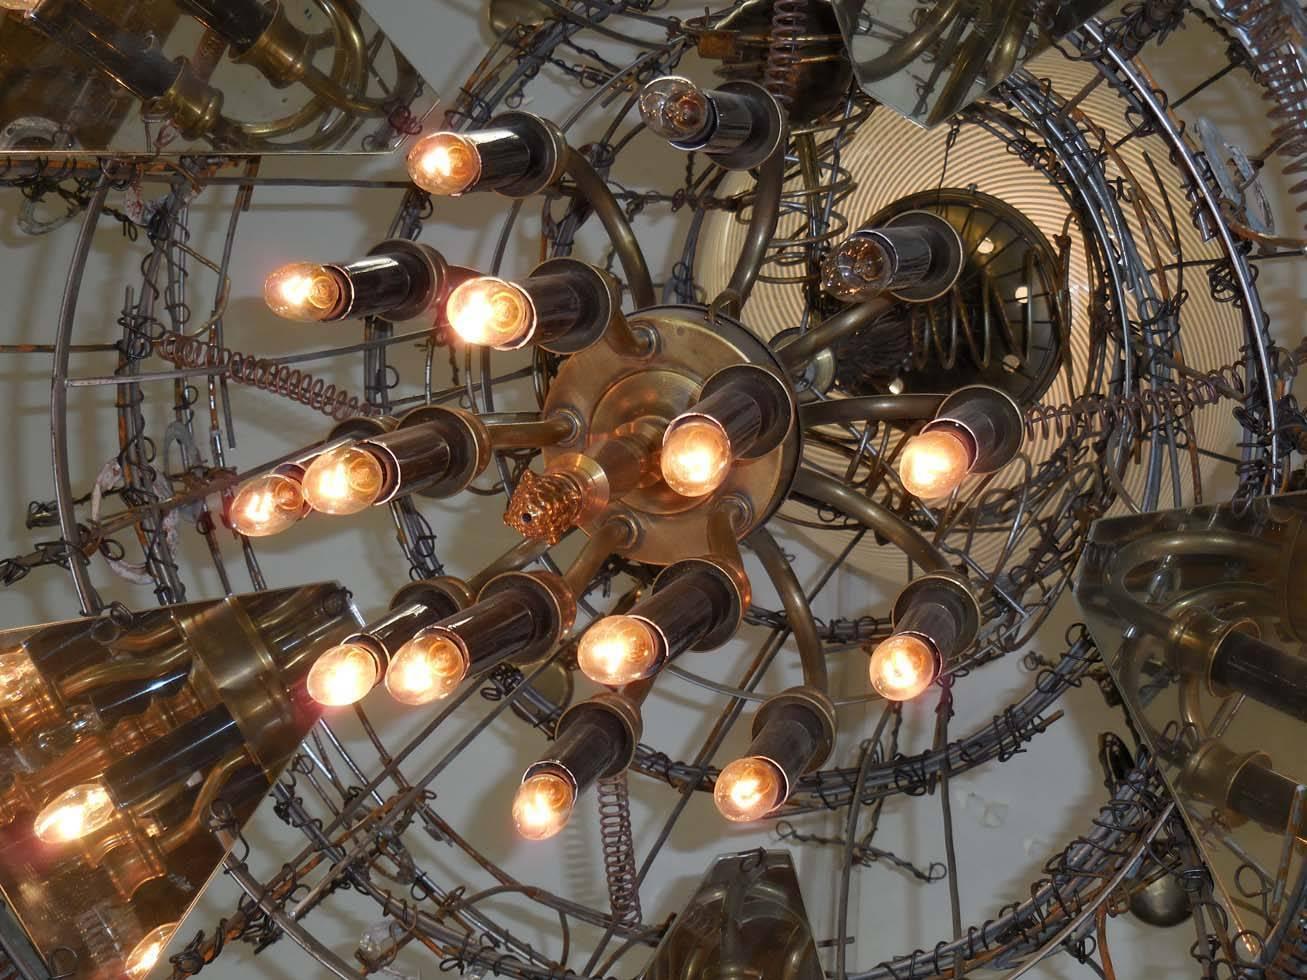 edison pendant metal itm light steampunk bulb hanging novelty lamp chandelier industrial vintage